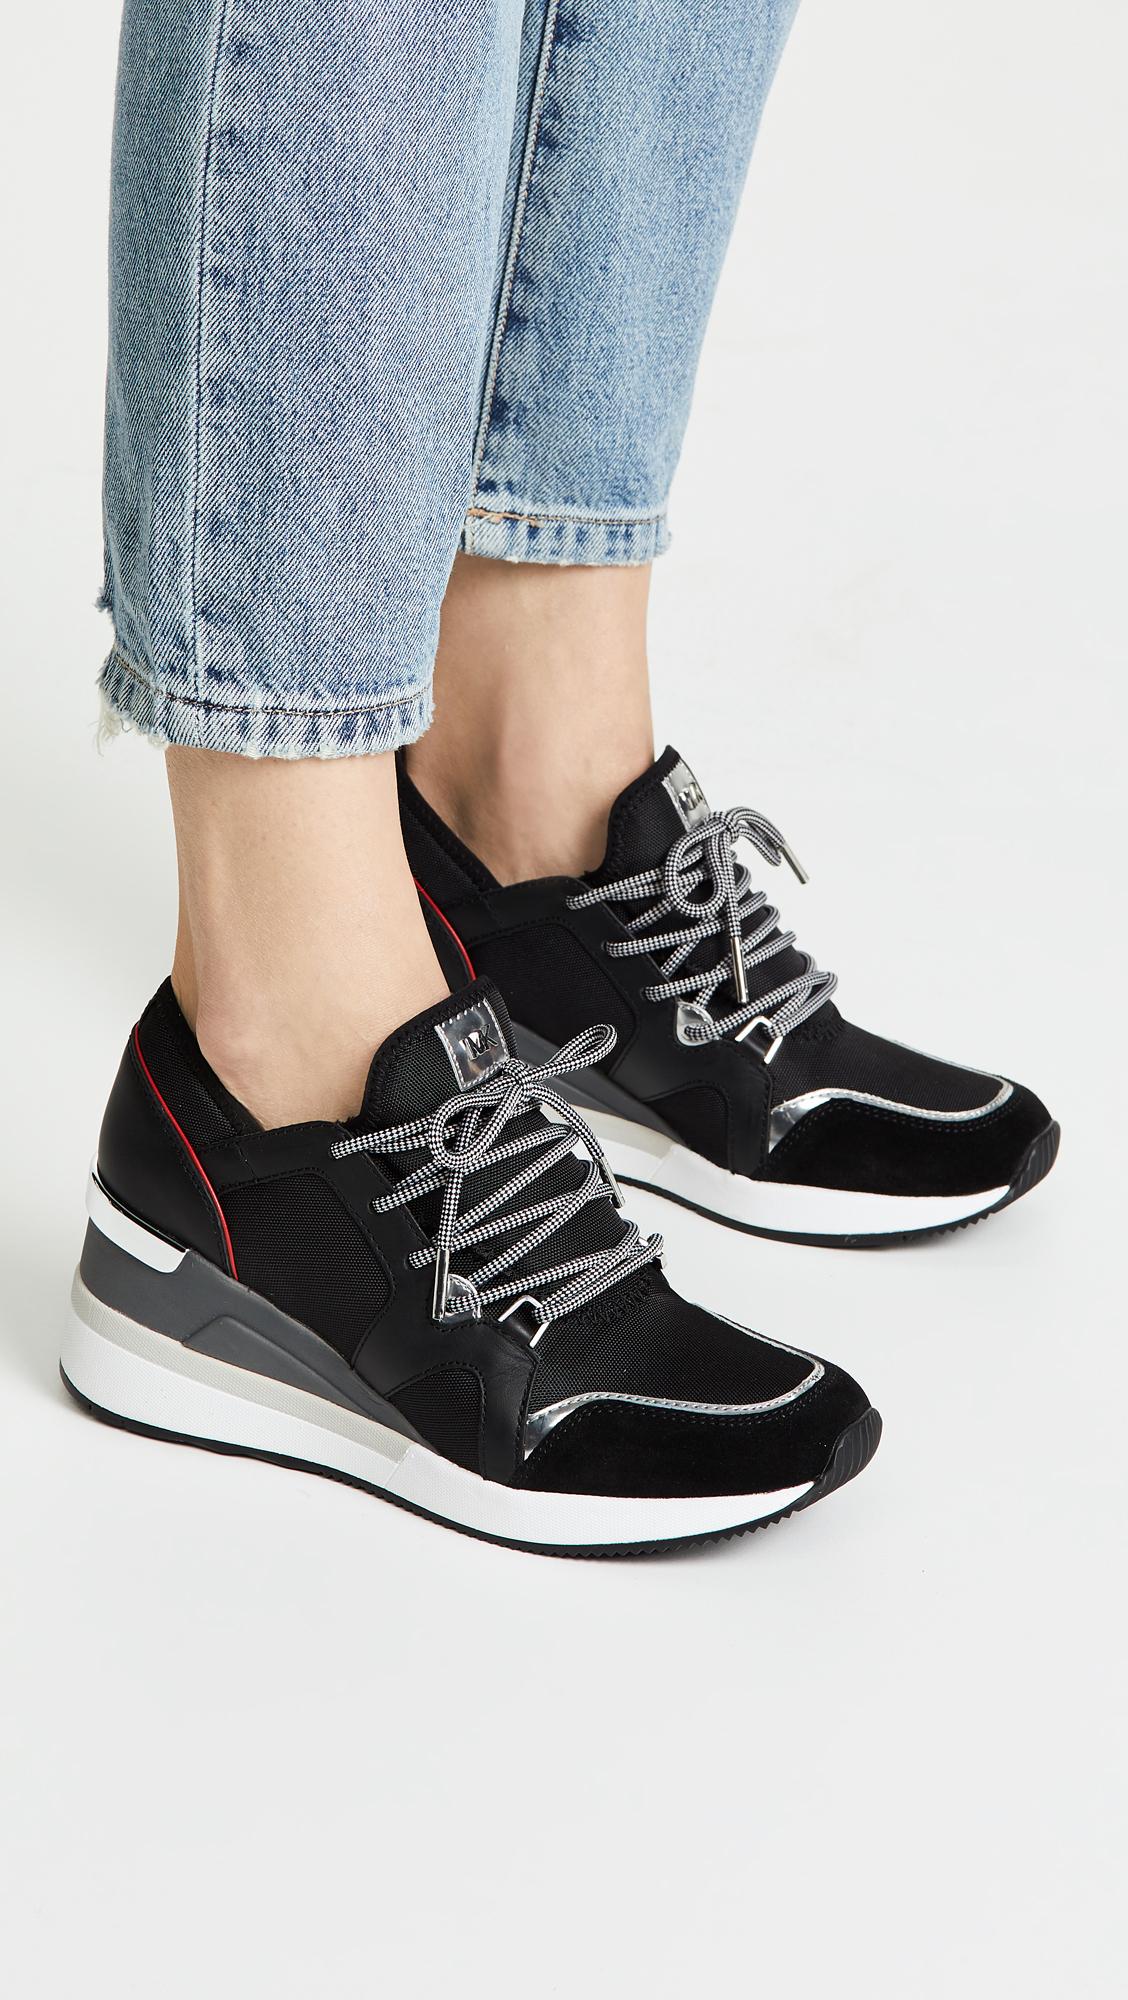 ff6118d4d72c MICHAEL Michael Kors Liv Trainer Sneakers